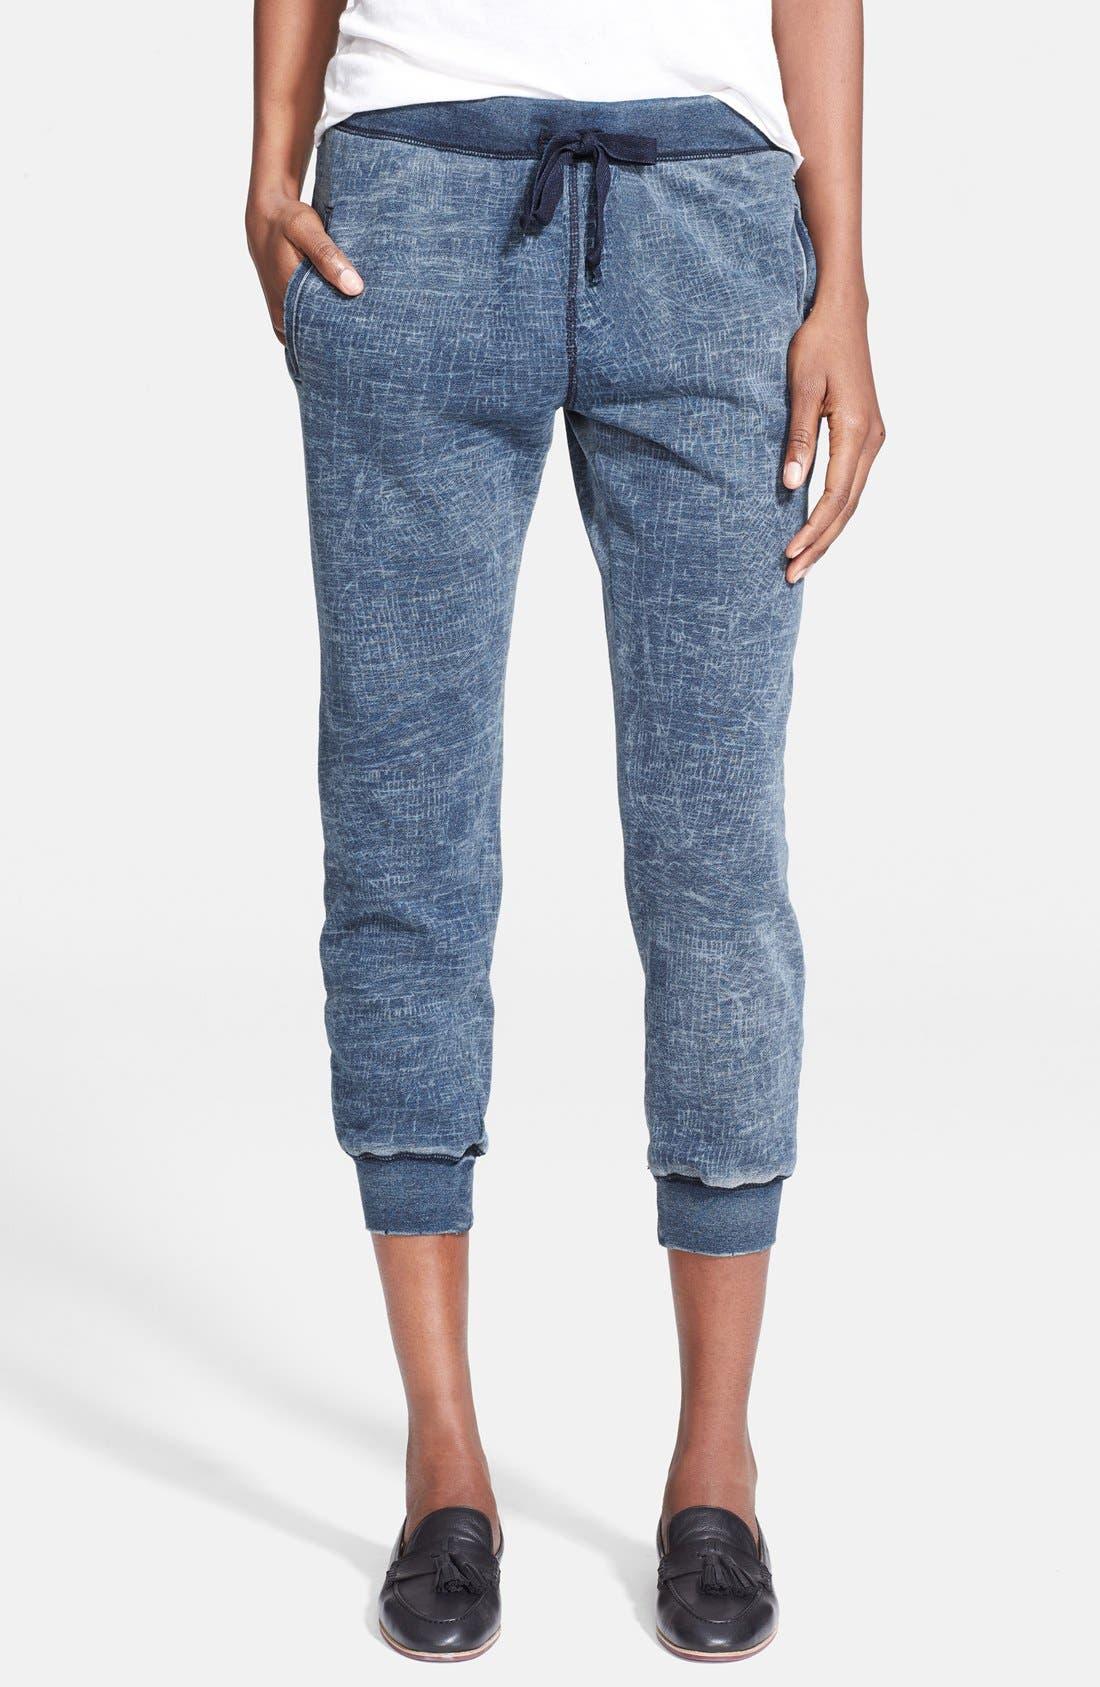 Alternate Image 1 Selected - Current/Elliott 'The Slim Vintage' Cropped Sweatpants